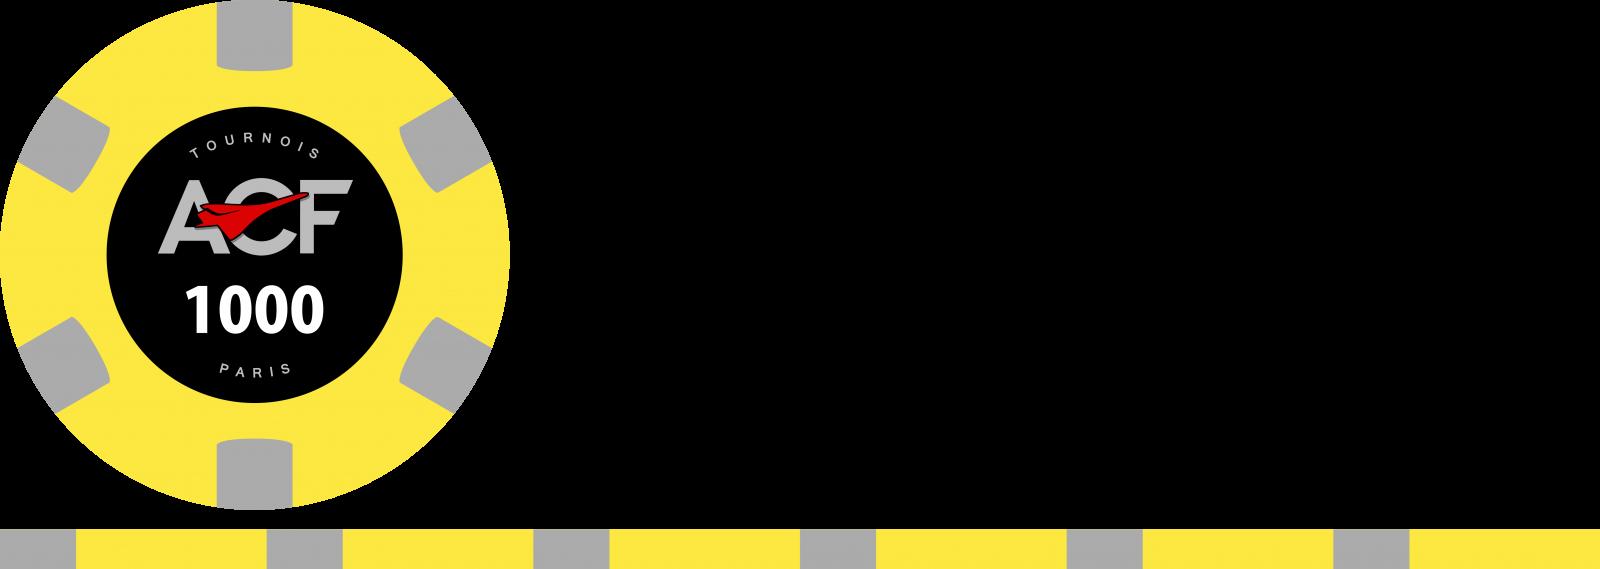 PolyClay_ACF_1000_v2.thumb.png.4ec536be560b08c6382c1efaa23e5309.png